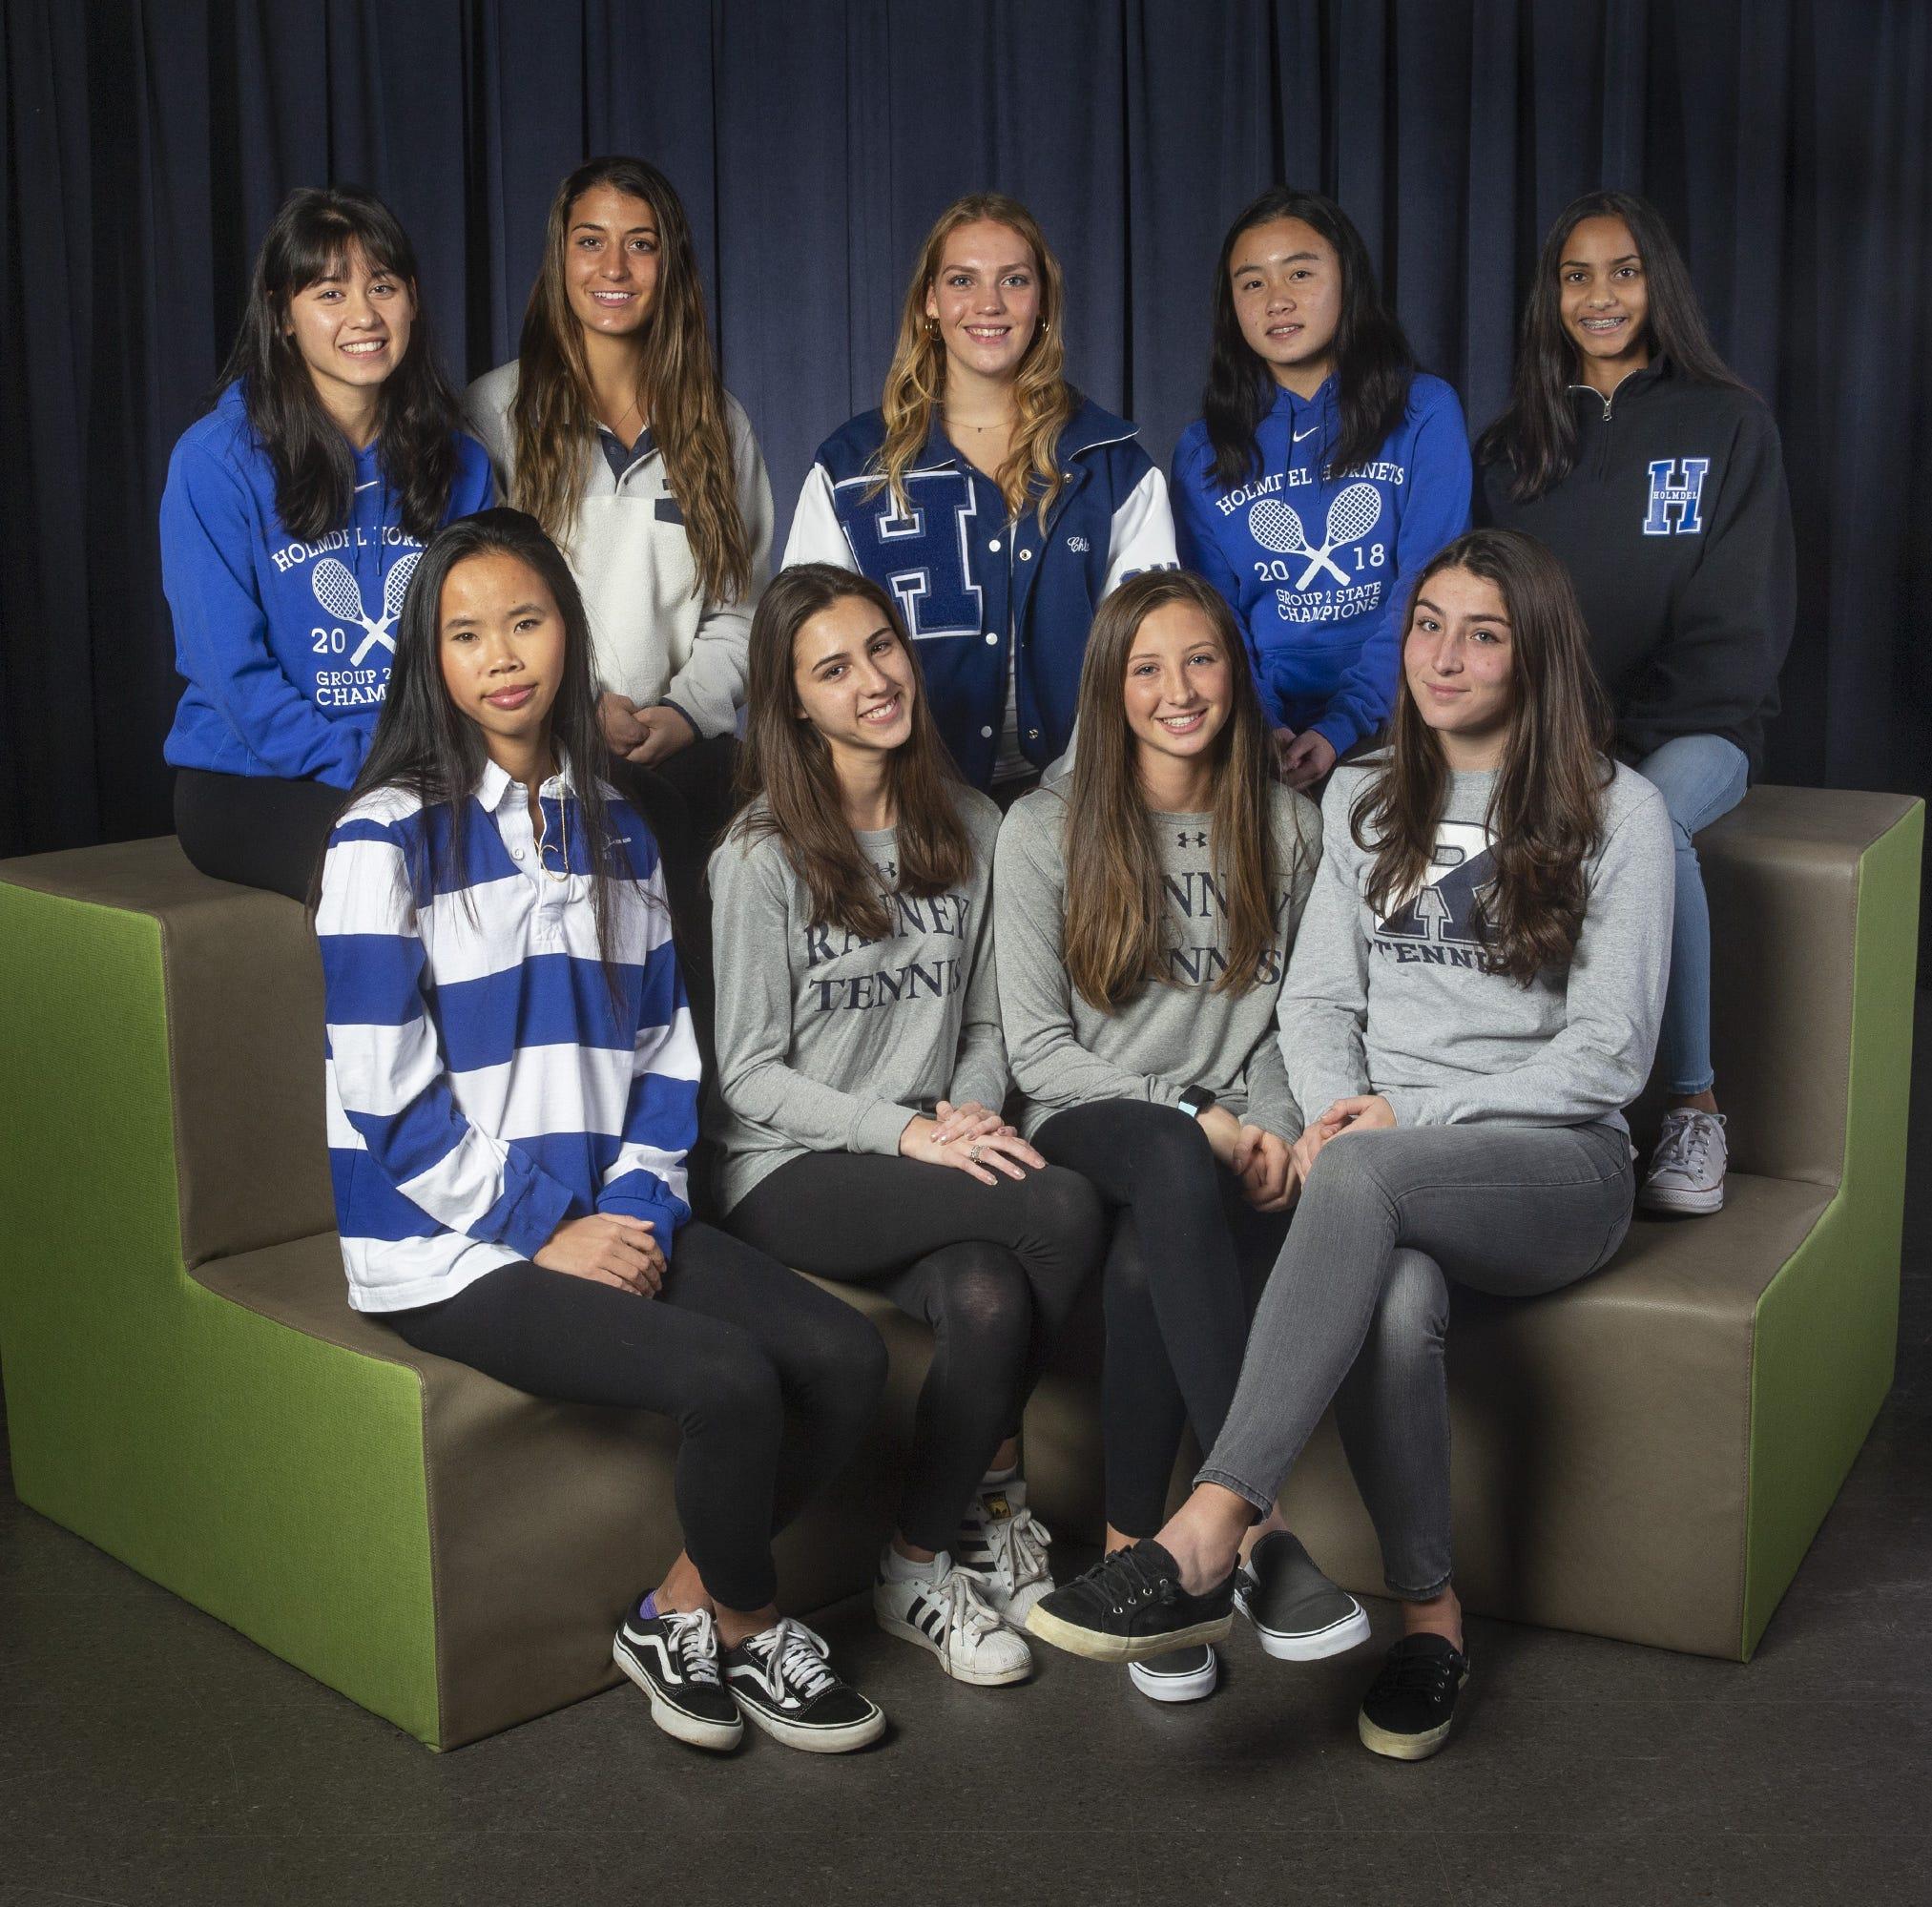 NJ girls tennis: Meet the 2018 All-Shore teams